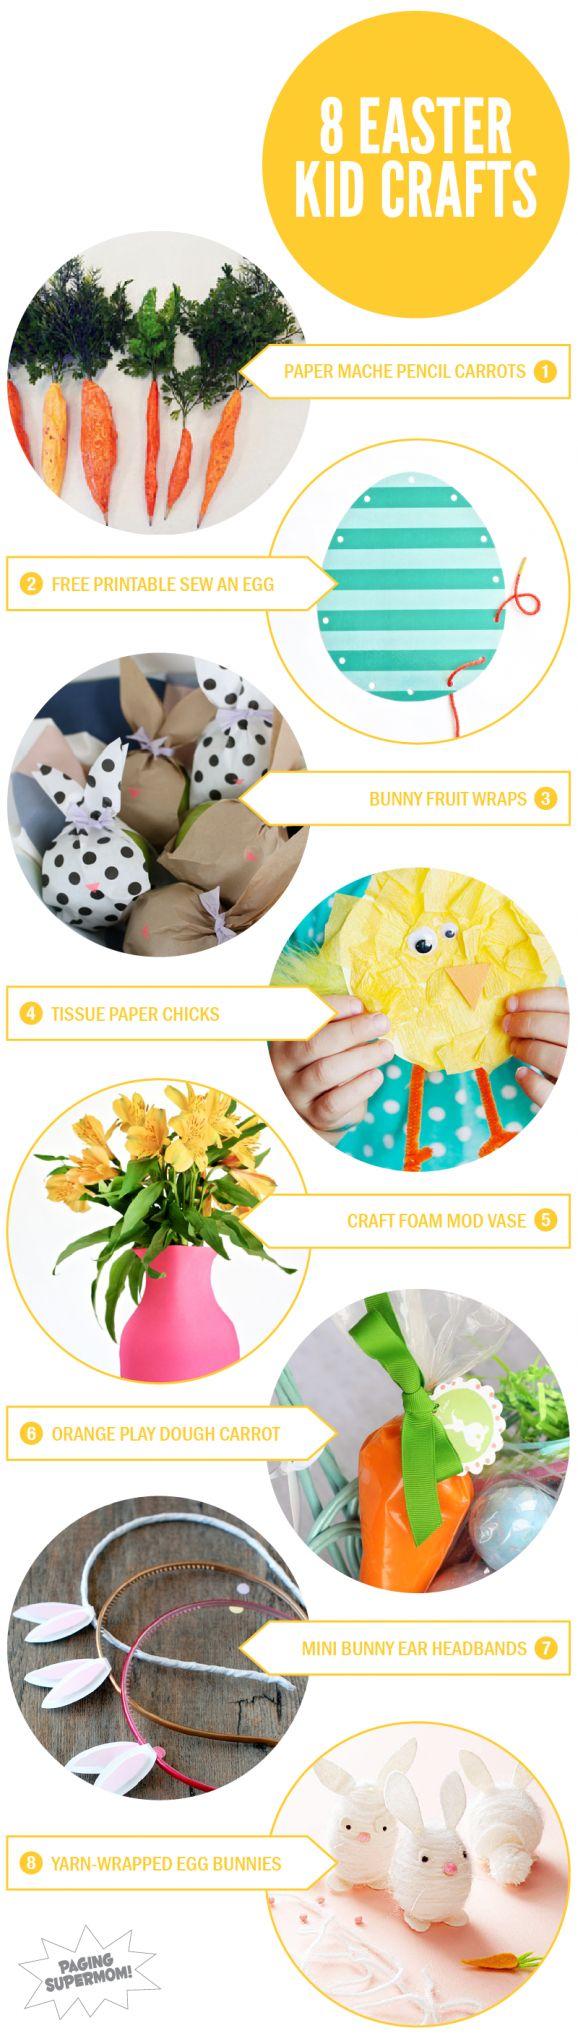 13 best easter images on pinterest easter ideas easter crafts 8 easter crafts for kids via pagingsupermom kidscrafts easter negle Choice Image